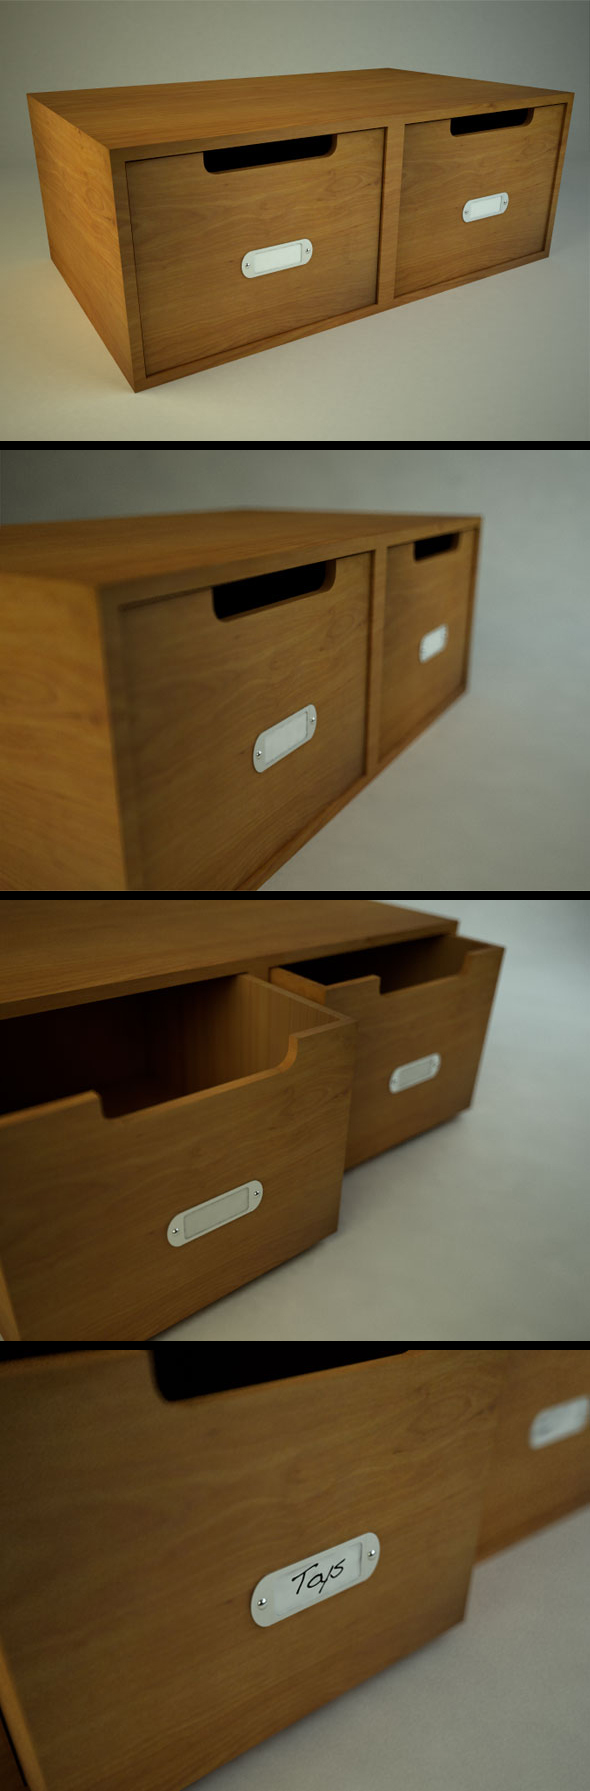 3DOcean Wooden Box 110197